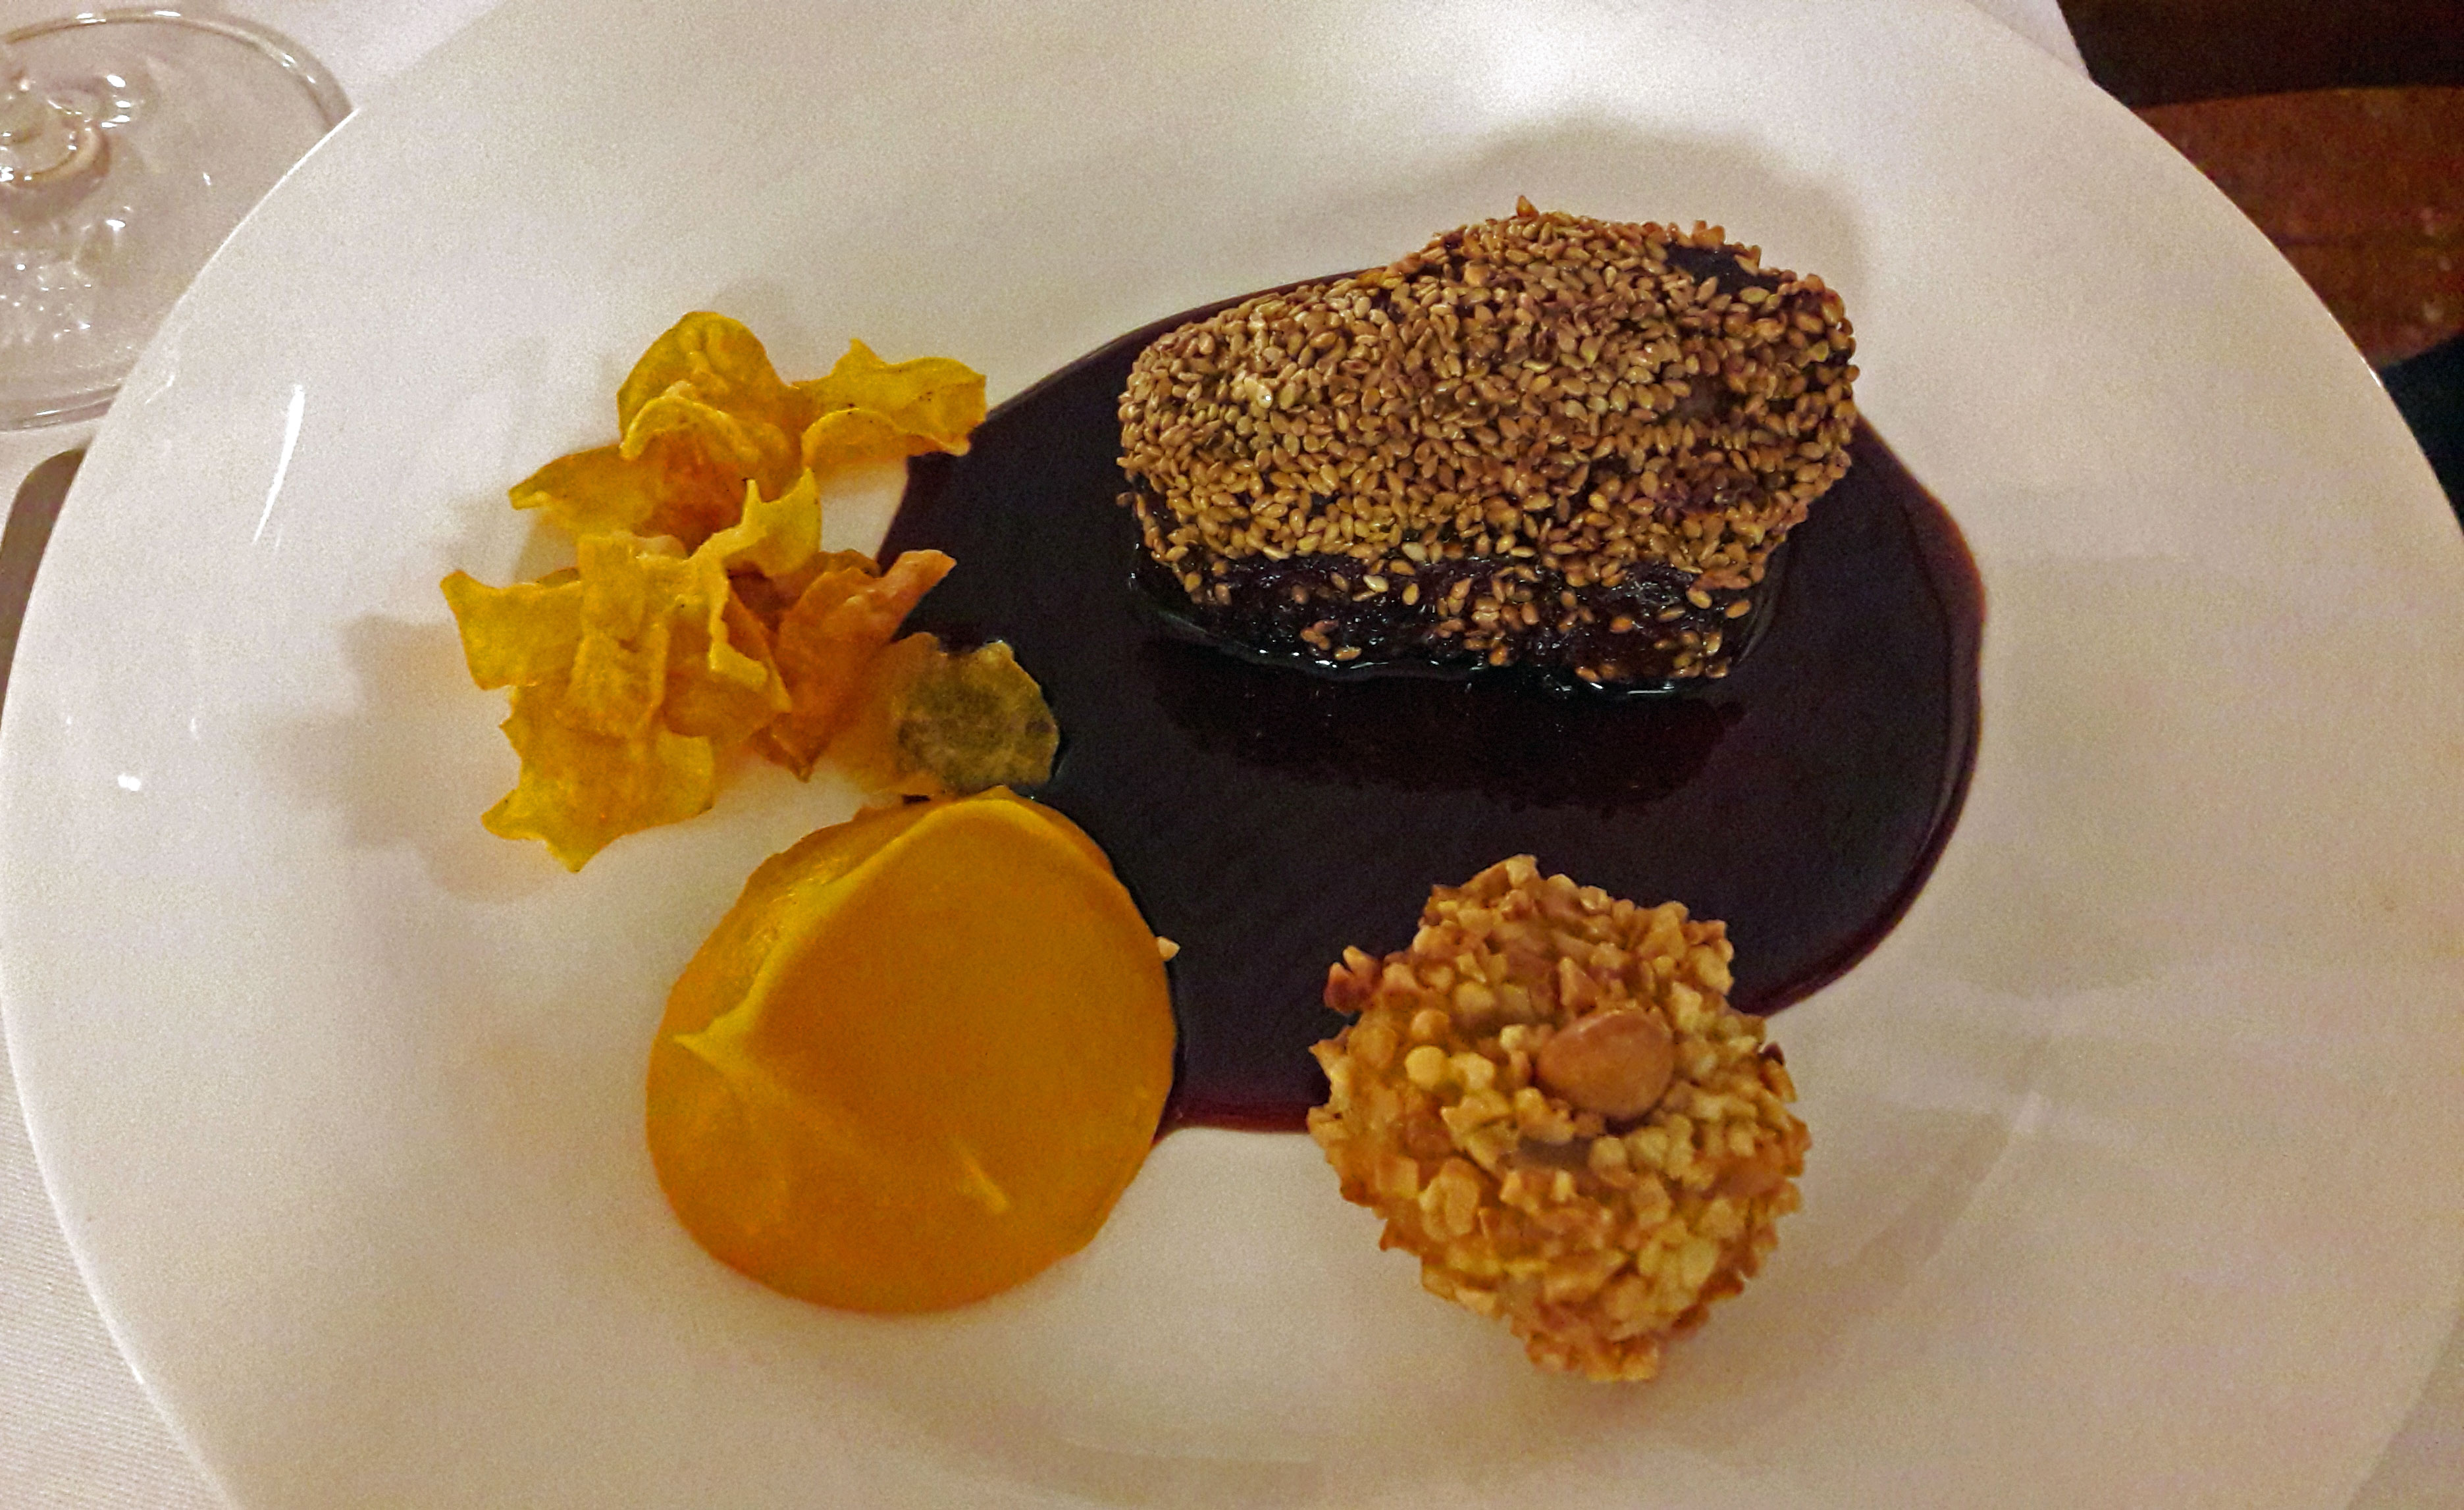 Restaurante en Figueres Medallón de ciervo, salsa de vino tinto al sésamo, Puré de boniato.